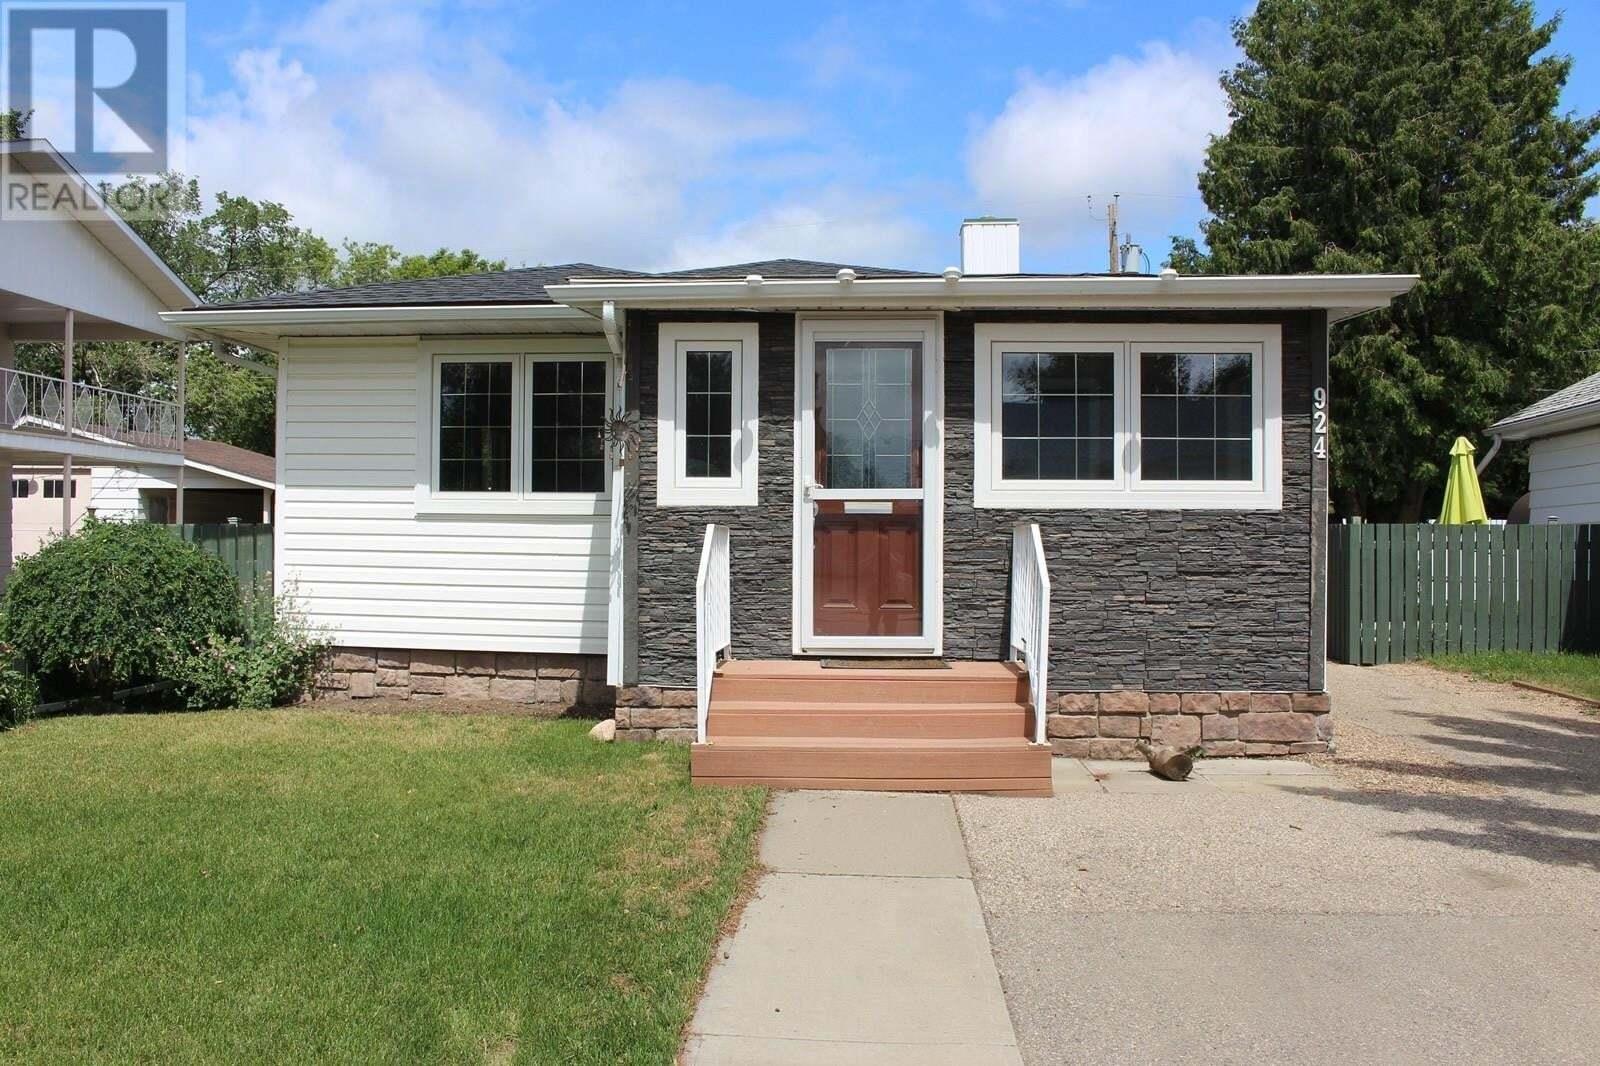 House for sale at 924 Hall St W Moose Jaw Saskatchewan - MLS: SK815531